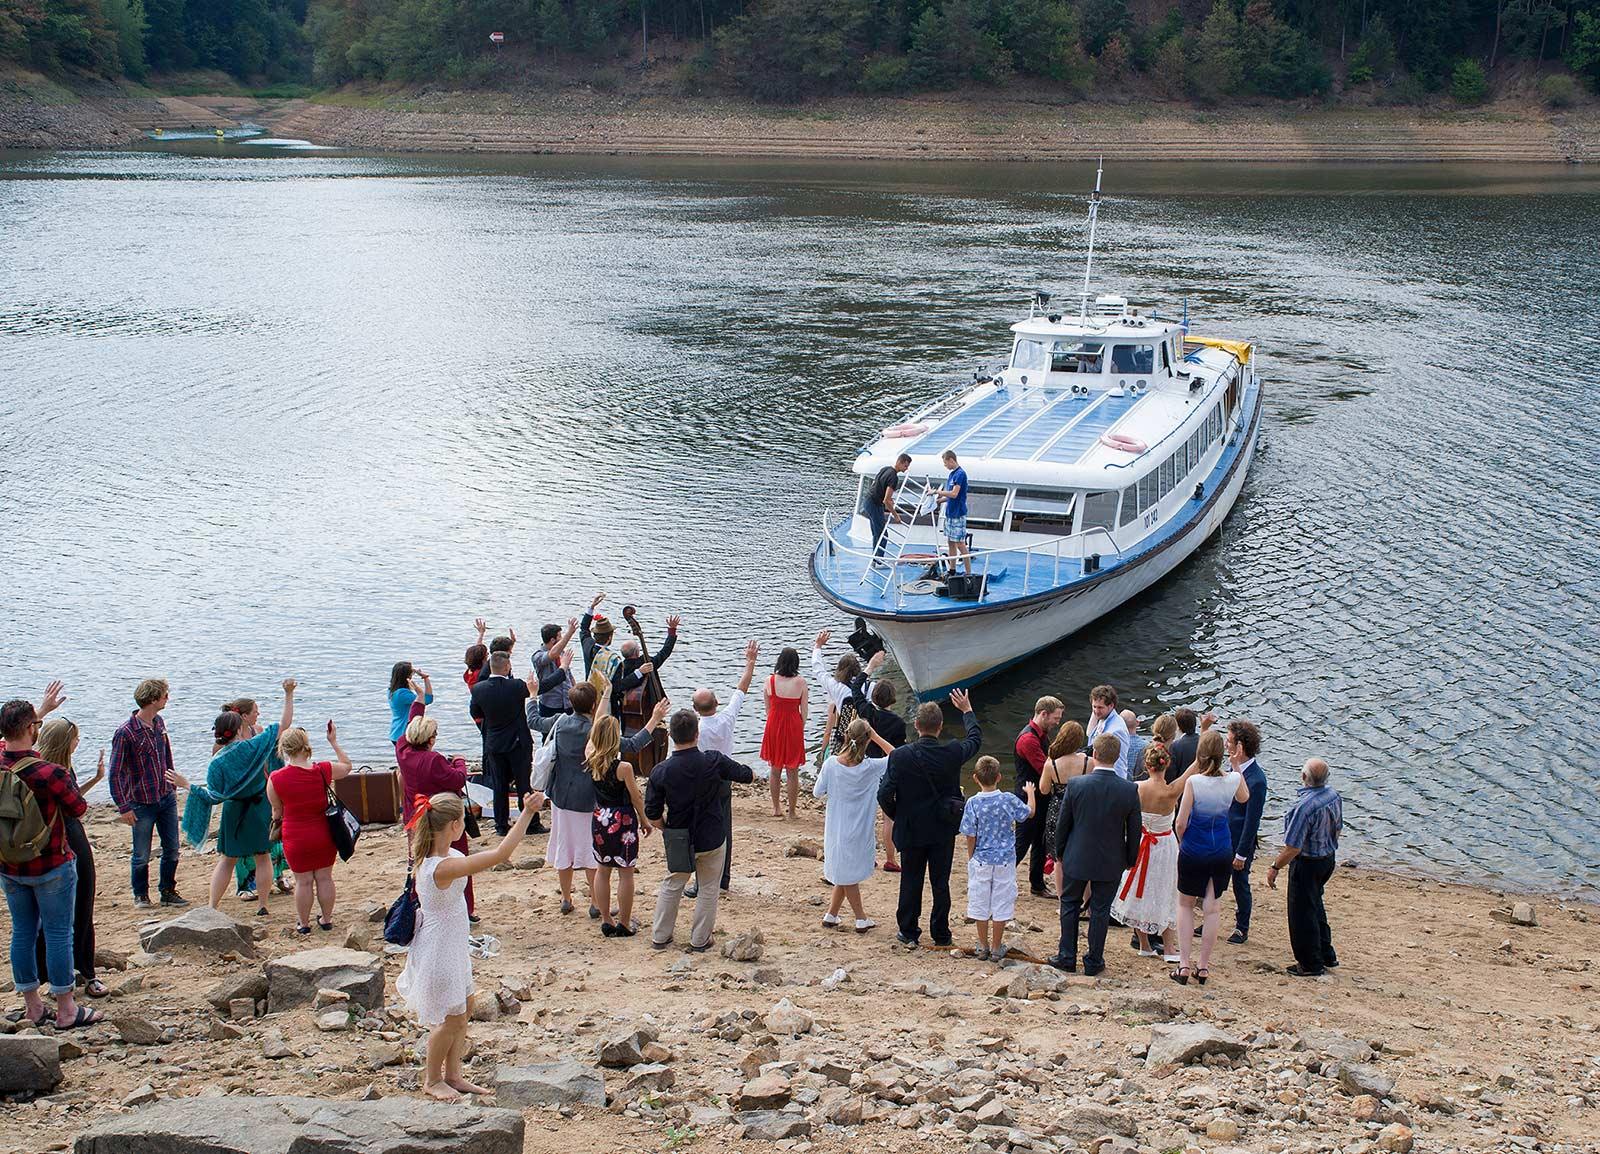 31 parnik orlik svatebni fotograf ales motejl jizni cechy